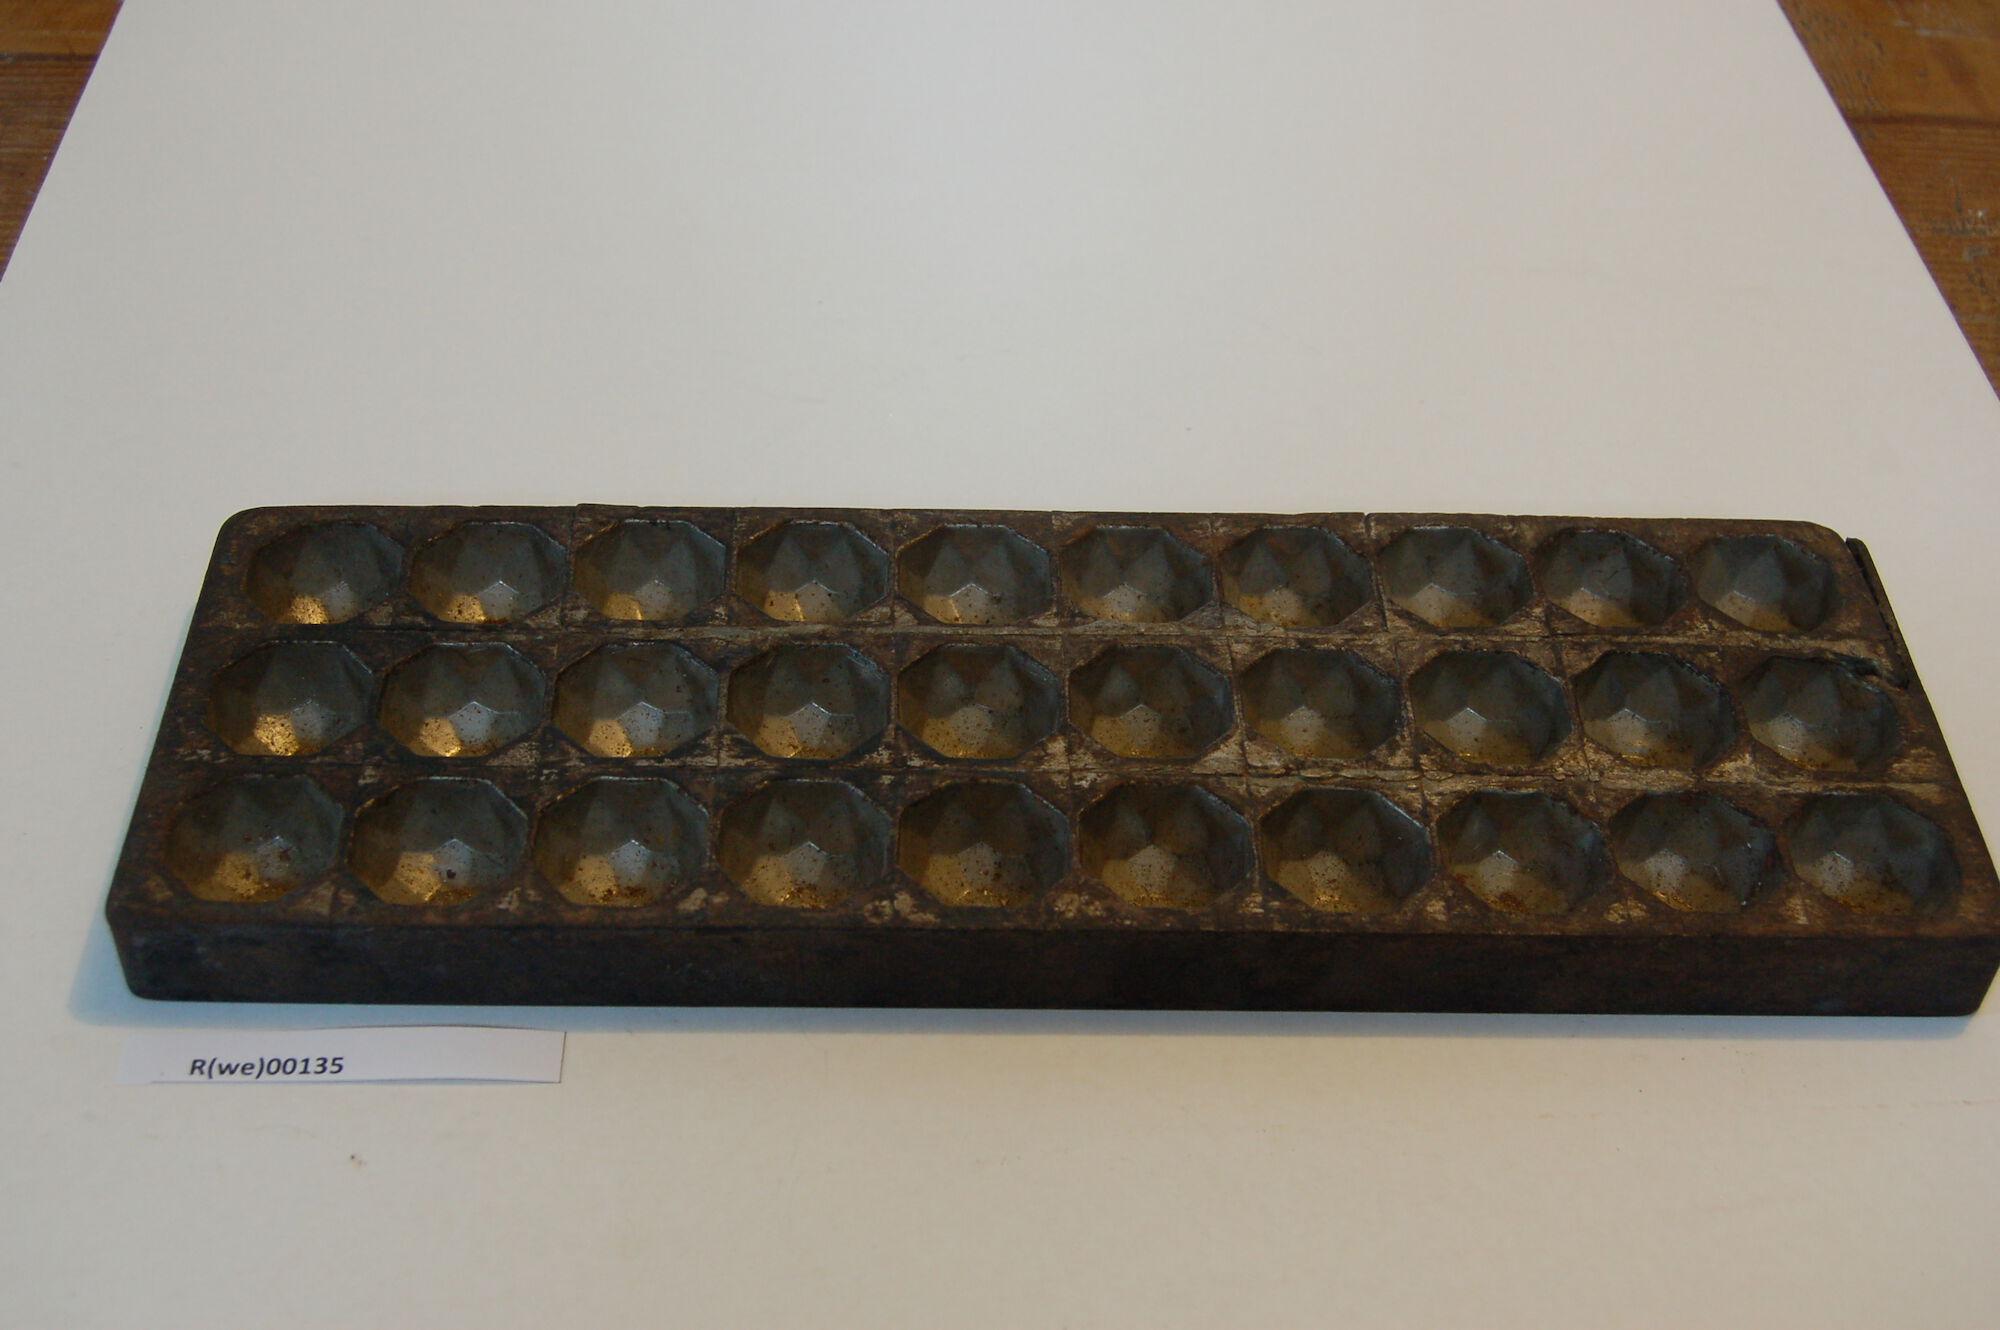 Ronse MUST: bakkersgereedschap R(we)00135.JPG